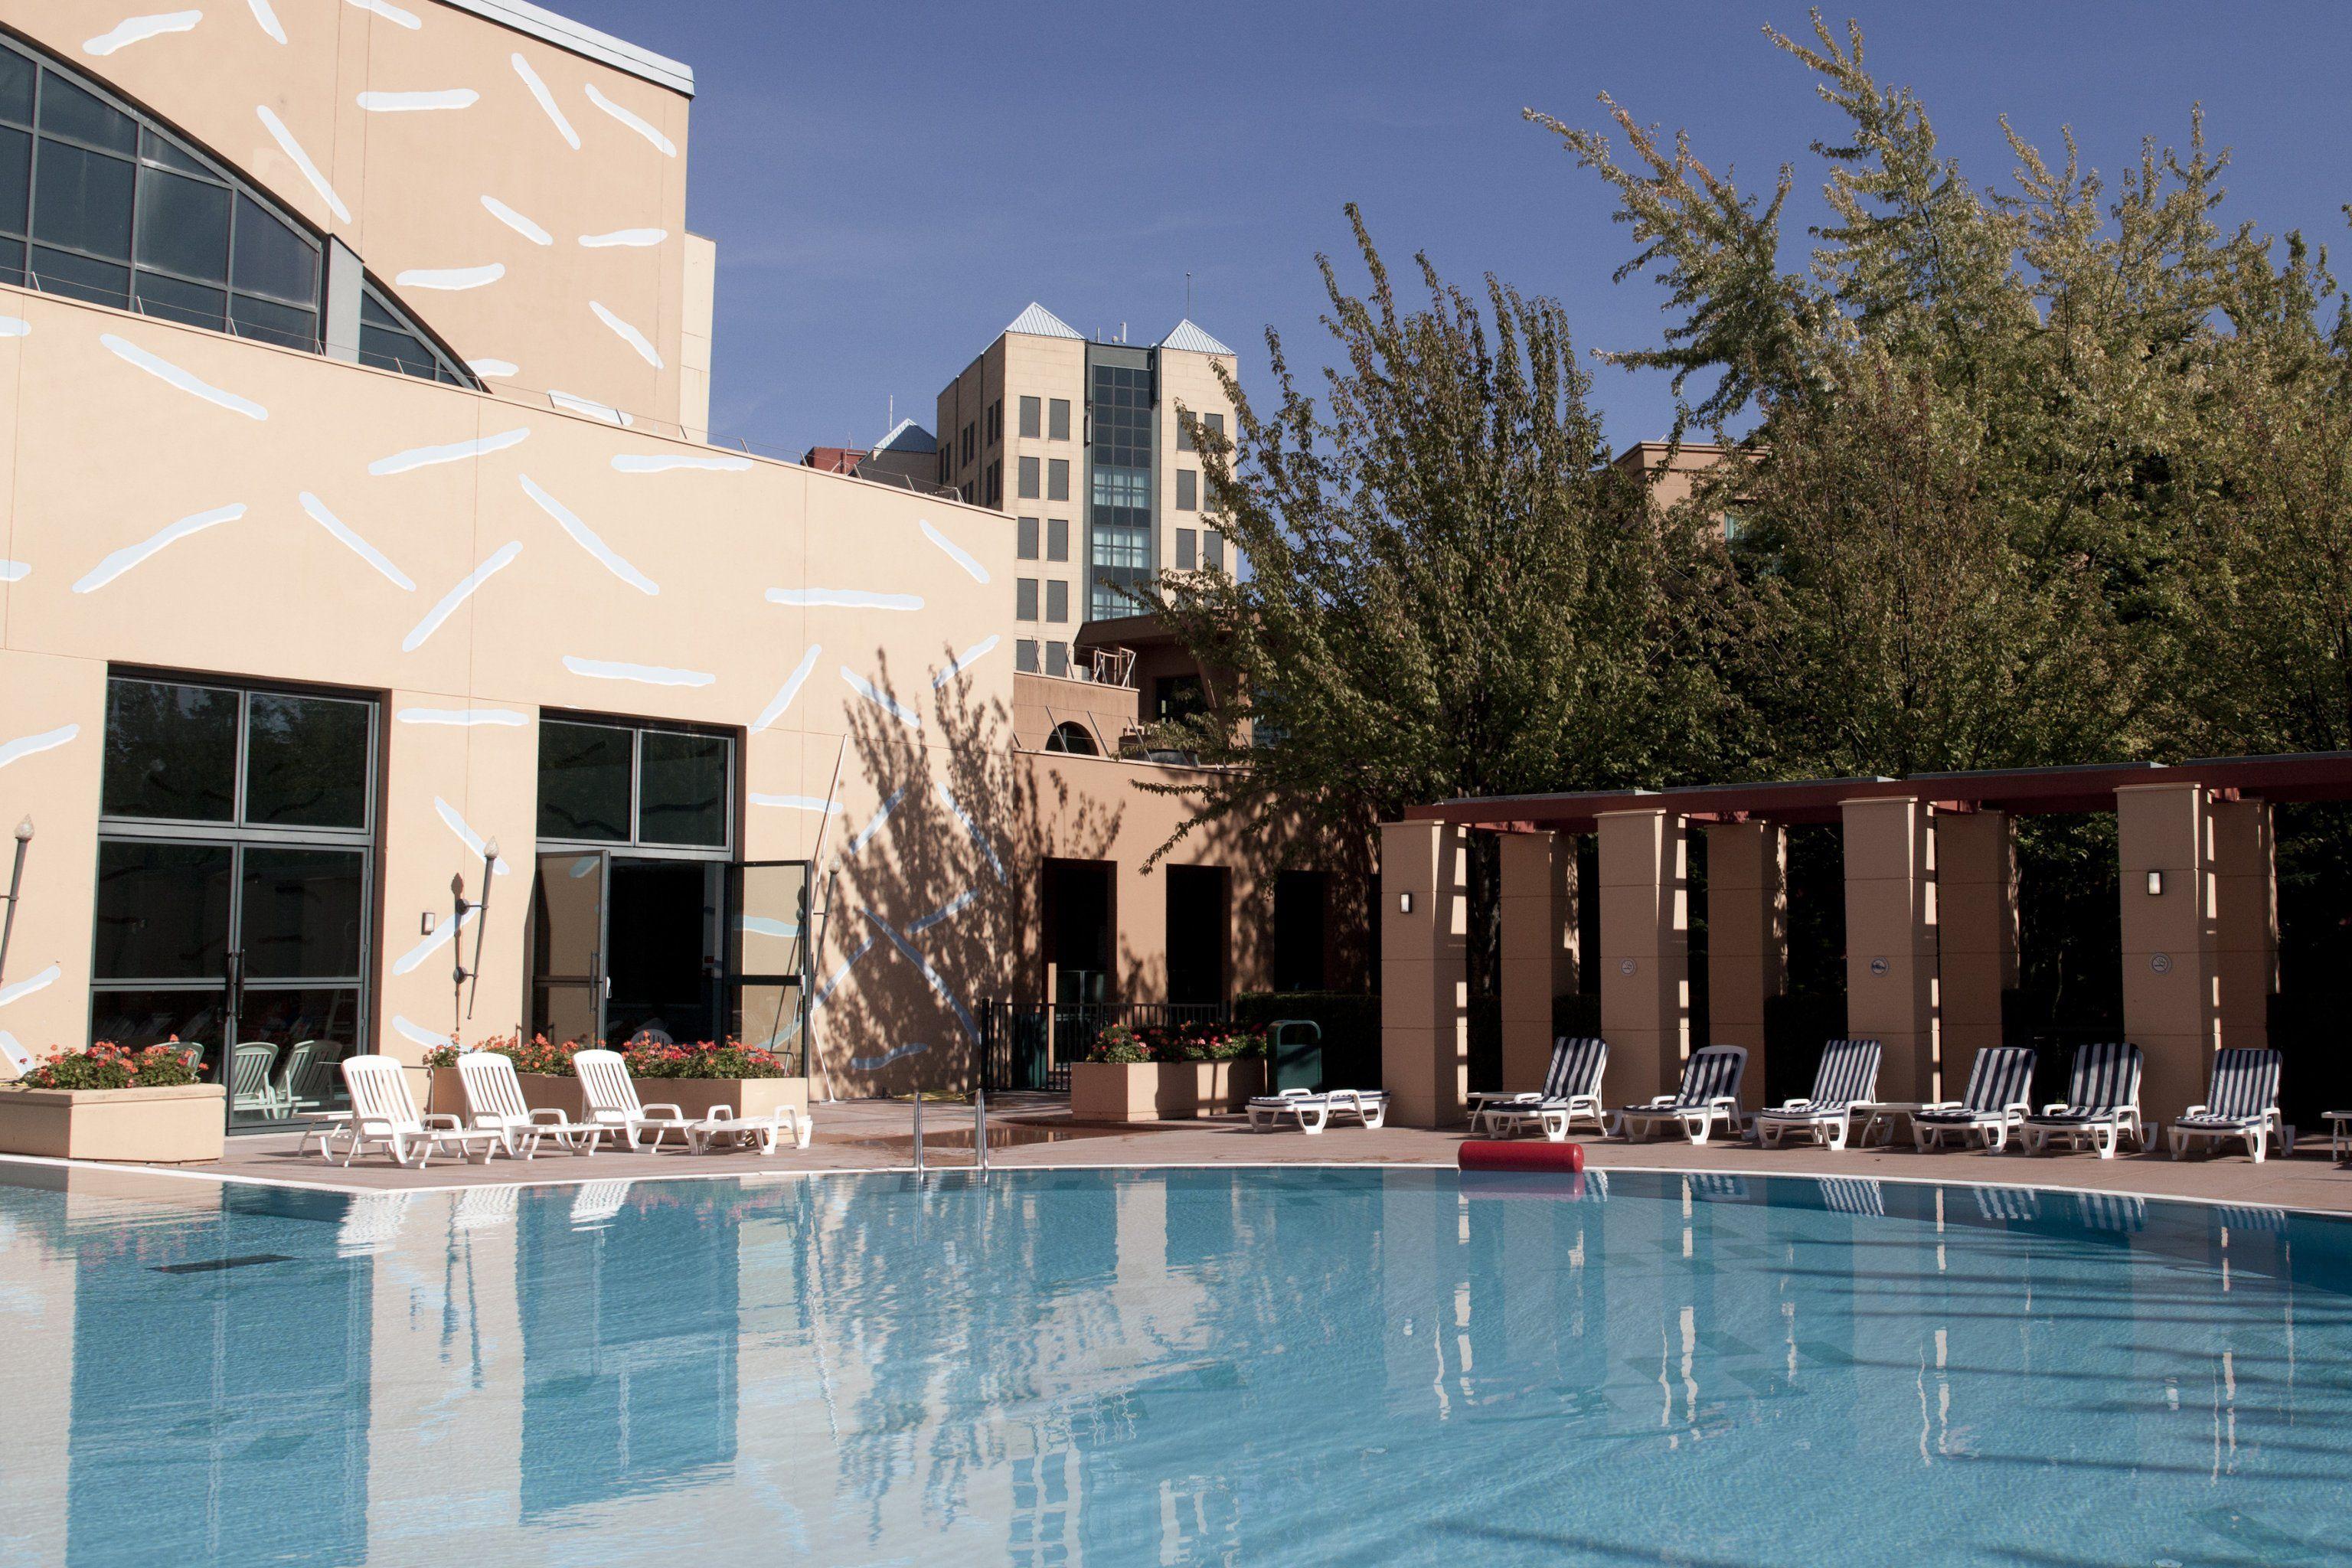 Disney Hotels Hotel New York Outdoor Pool Disneyland Paris